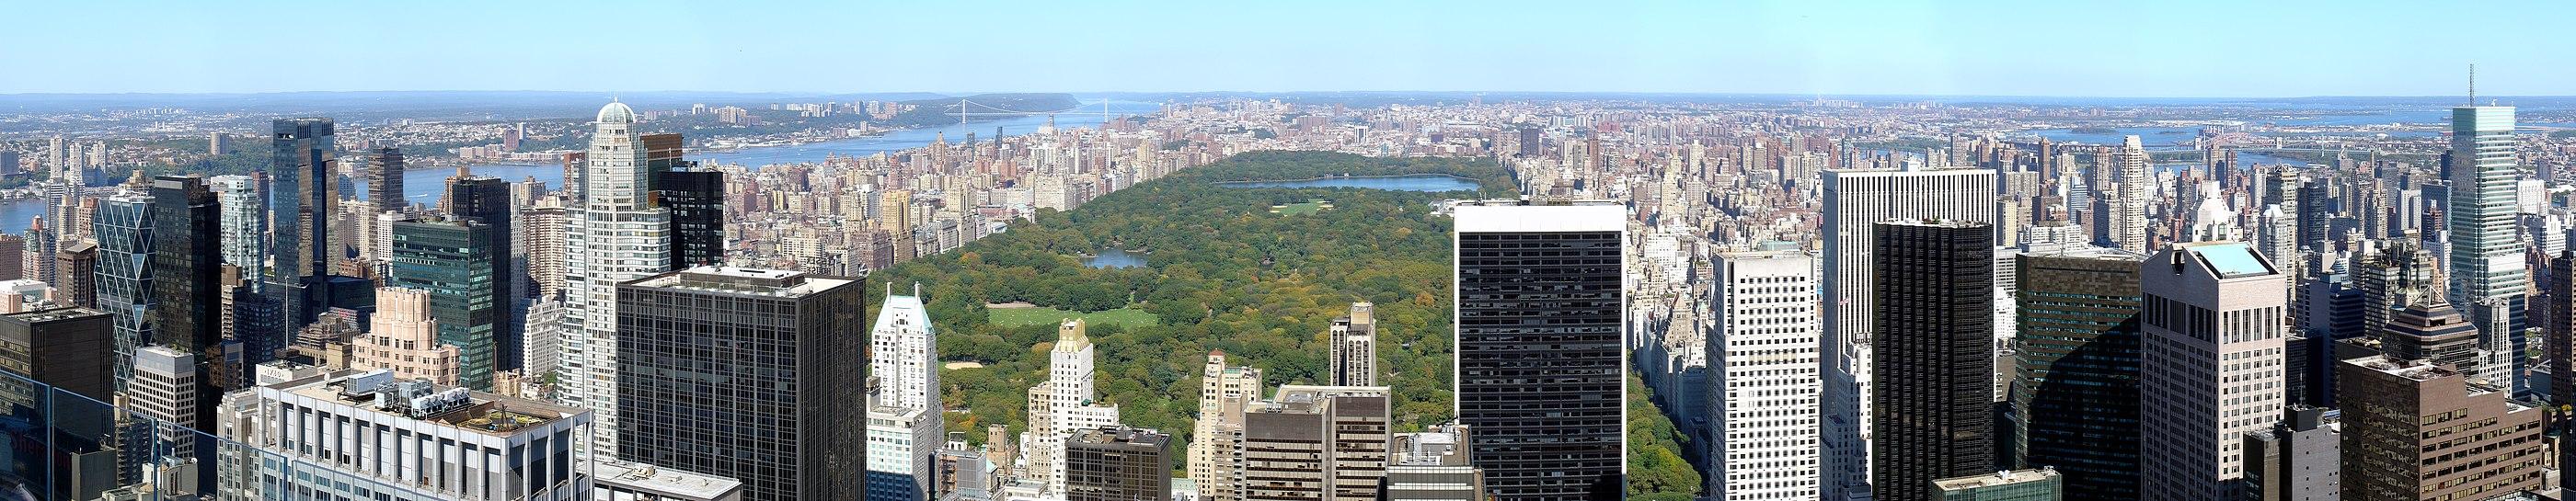 New York City - Wikiwand